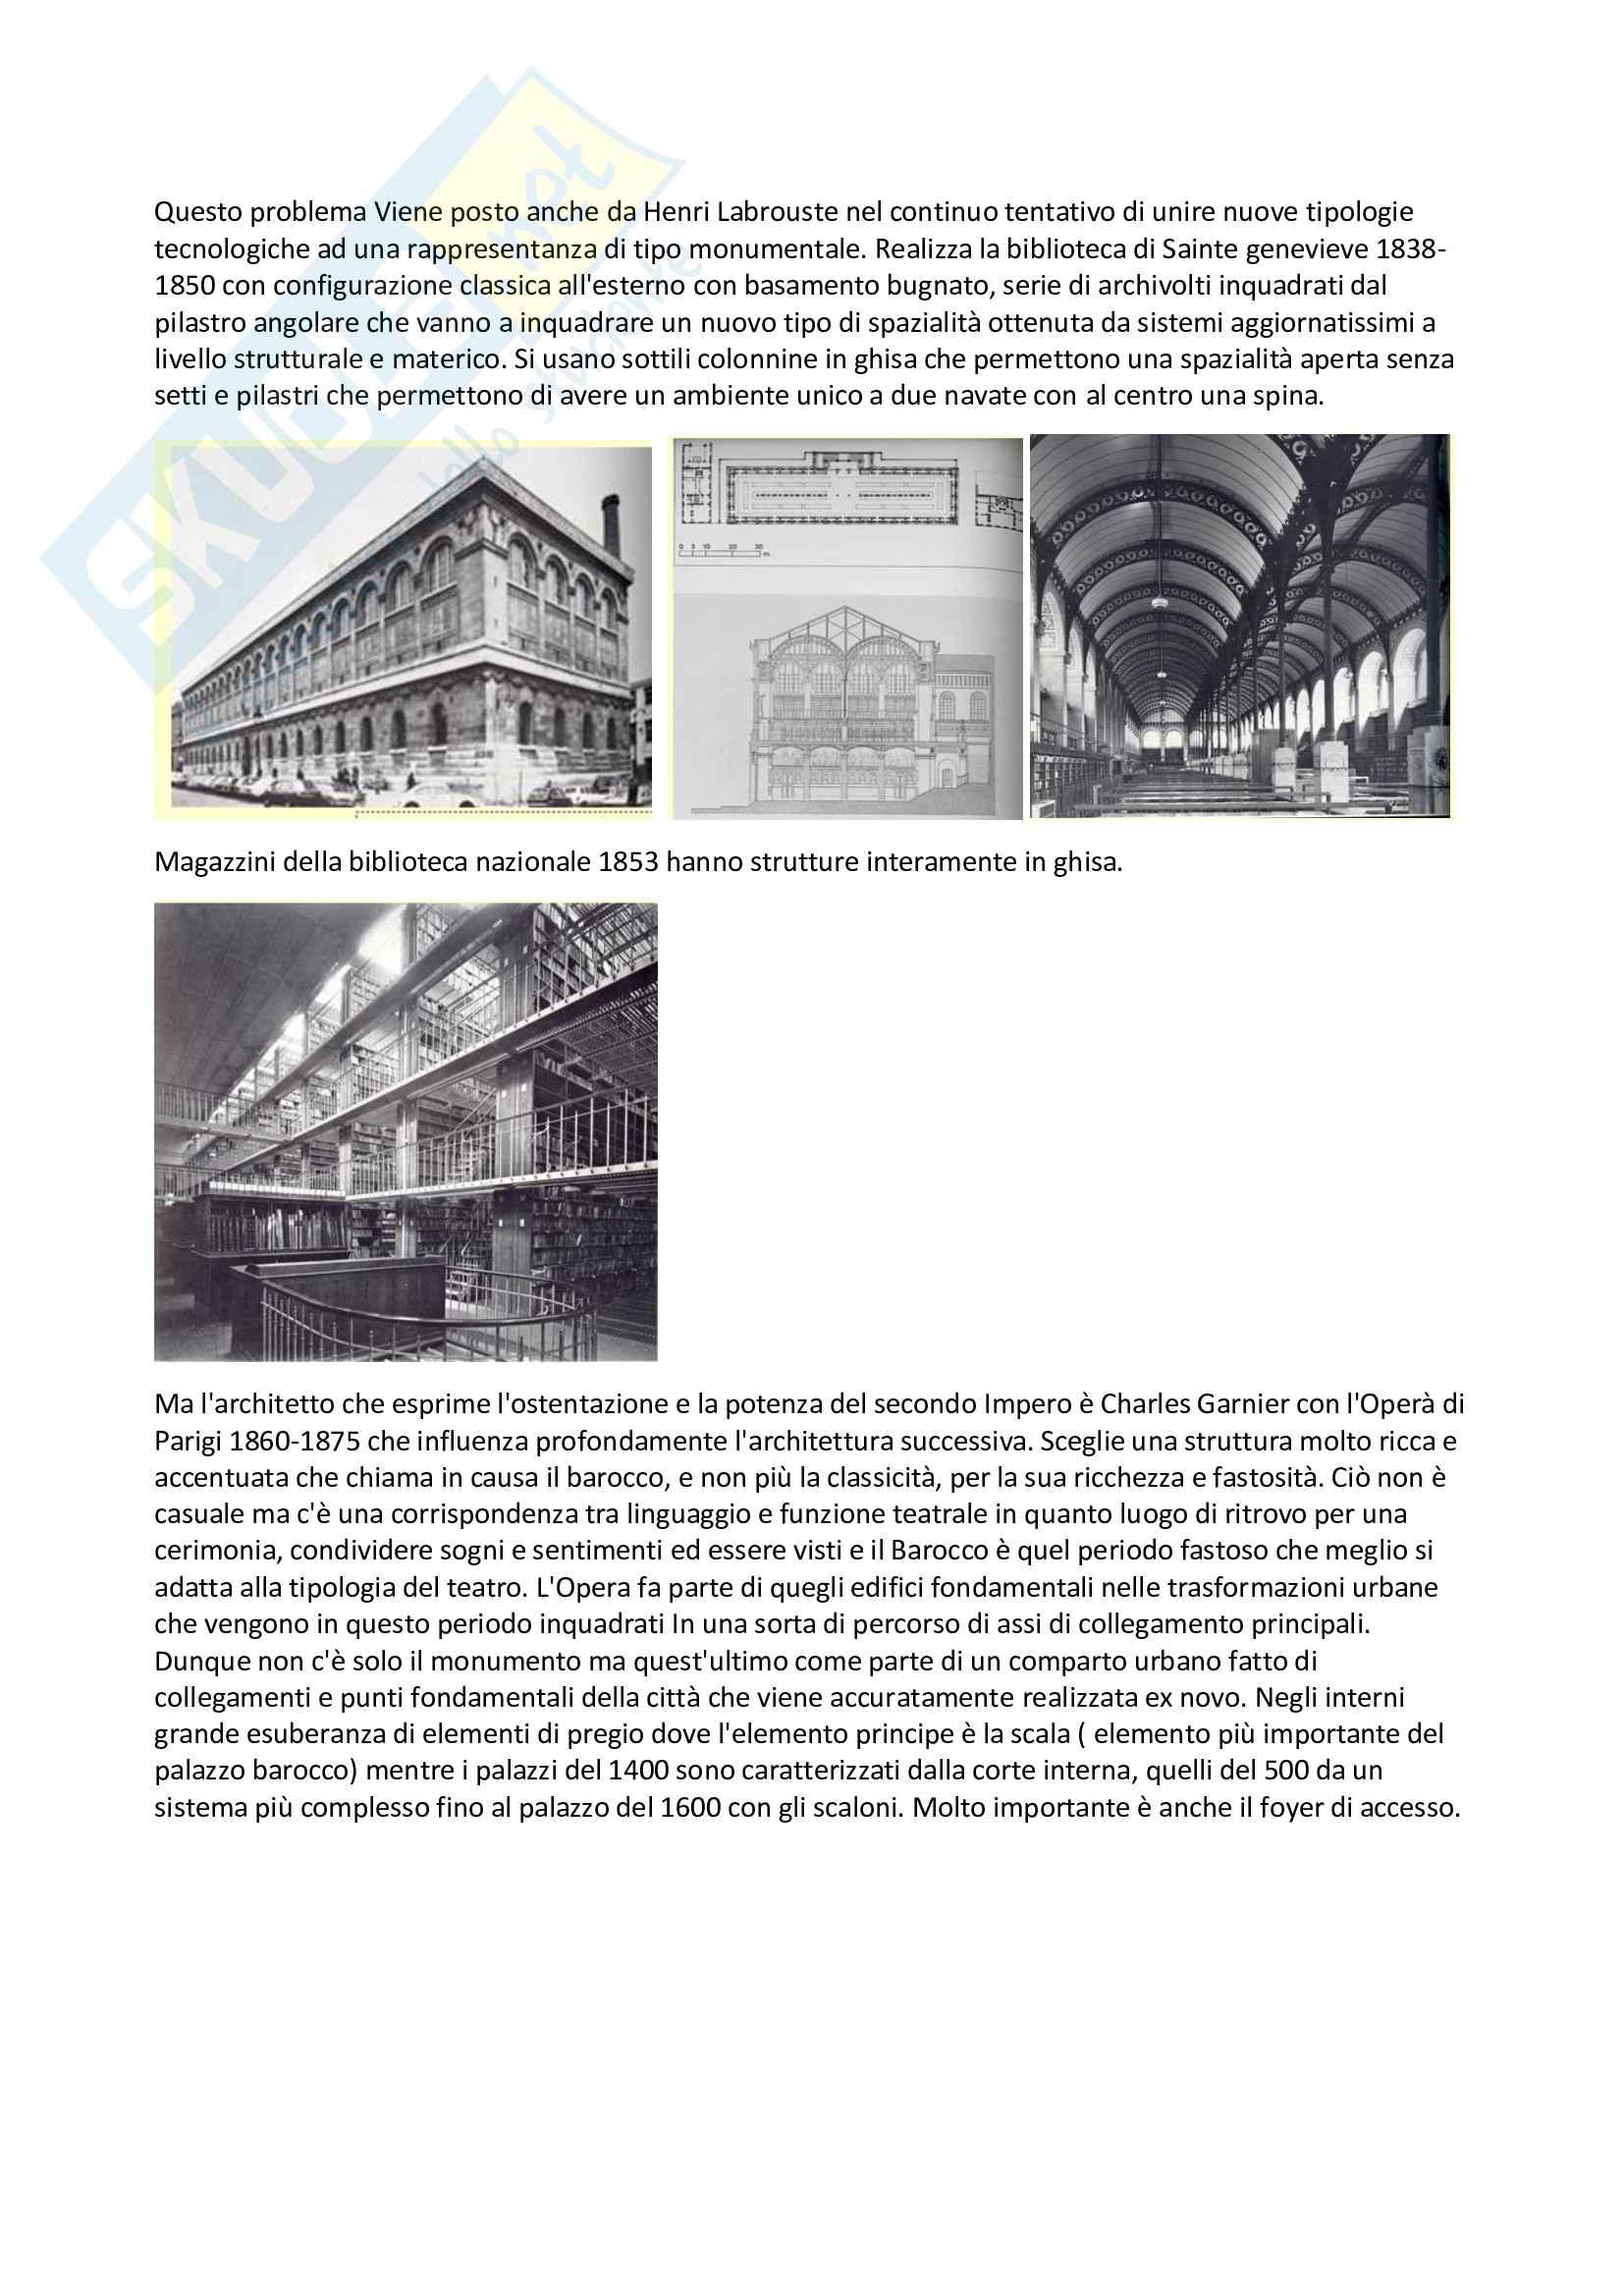 Storia dell'architettura 2, Iacobone, Lezioni Pag. 21